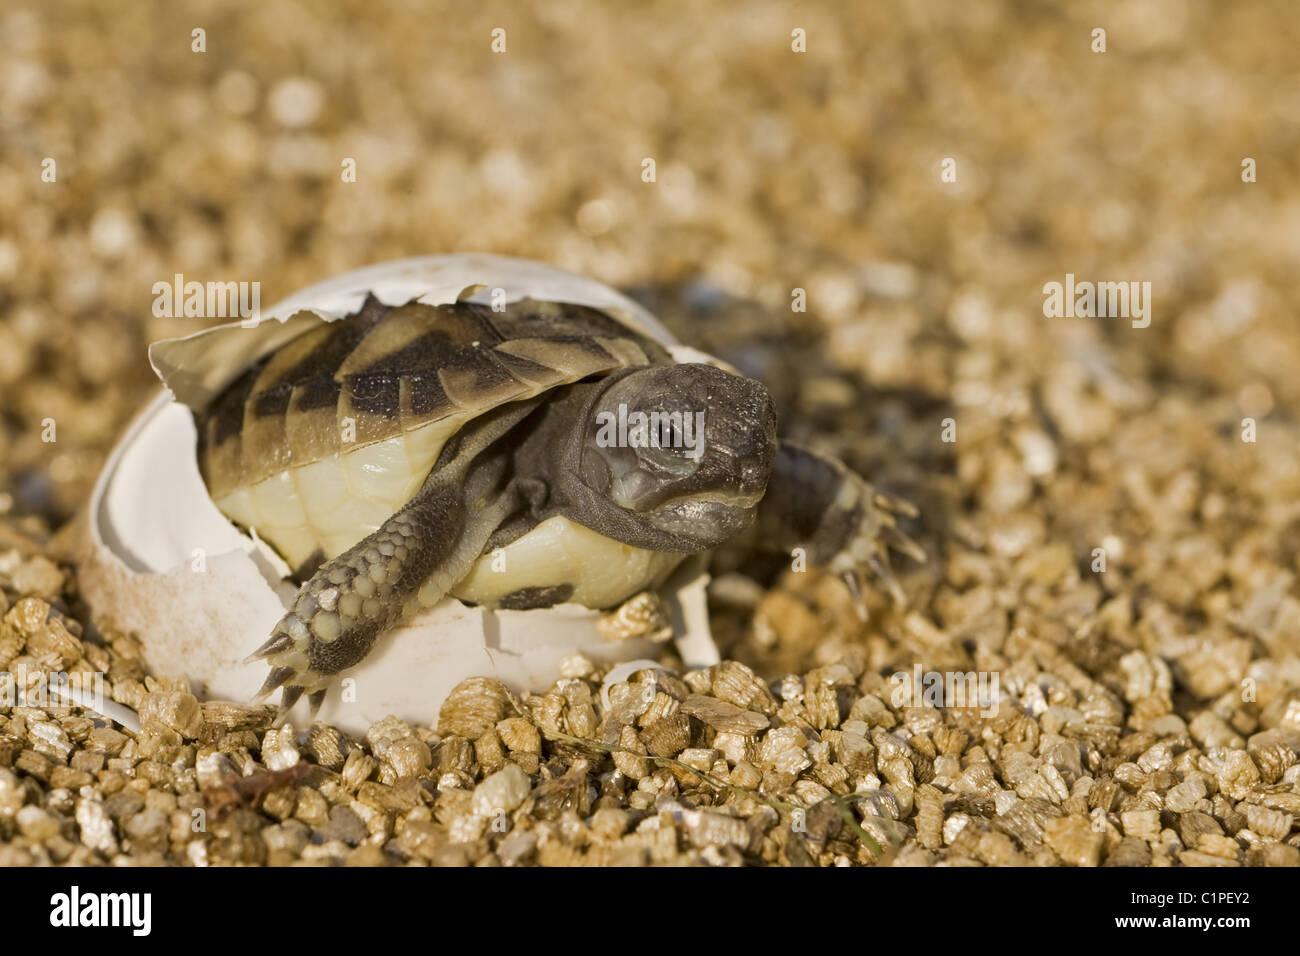 Hatching Tortoise - Stock Image